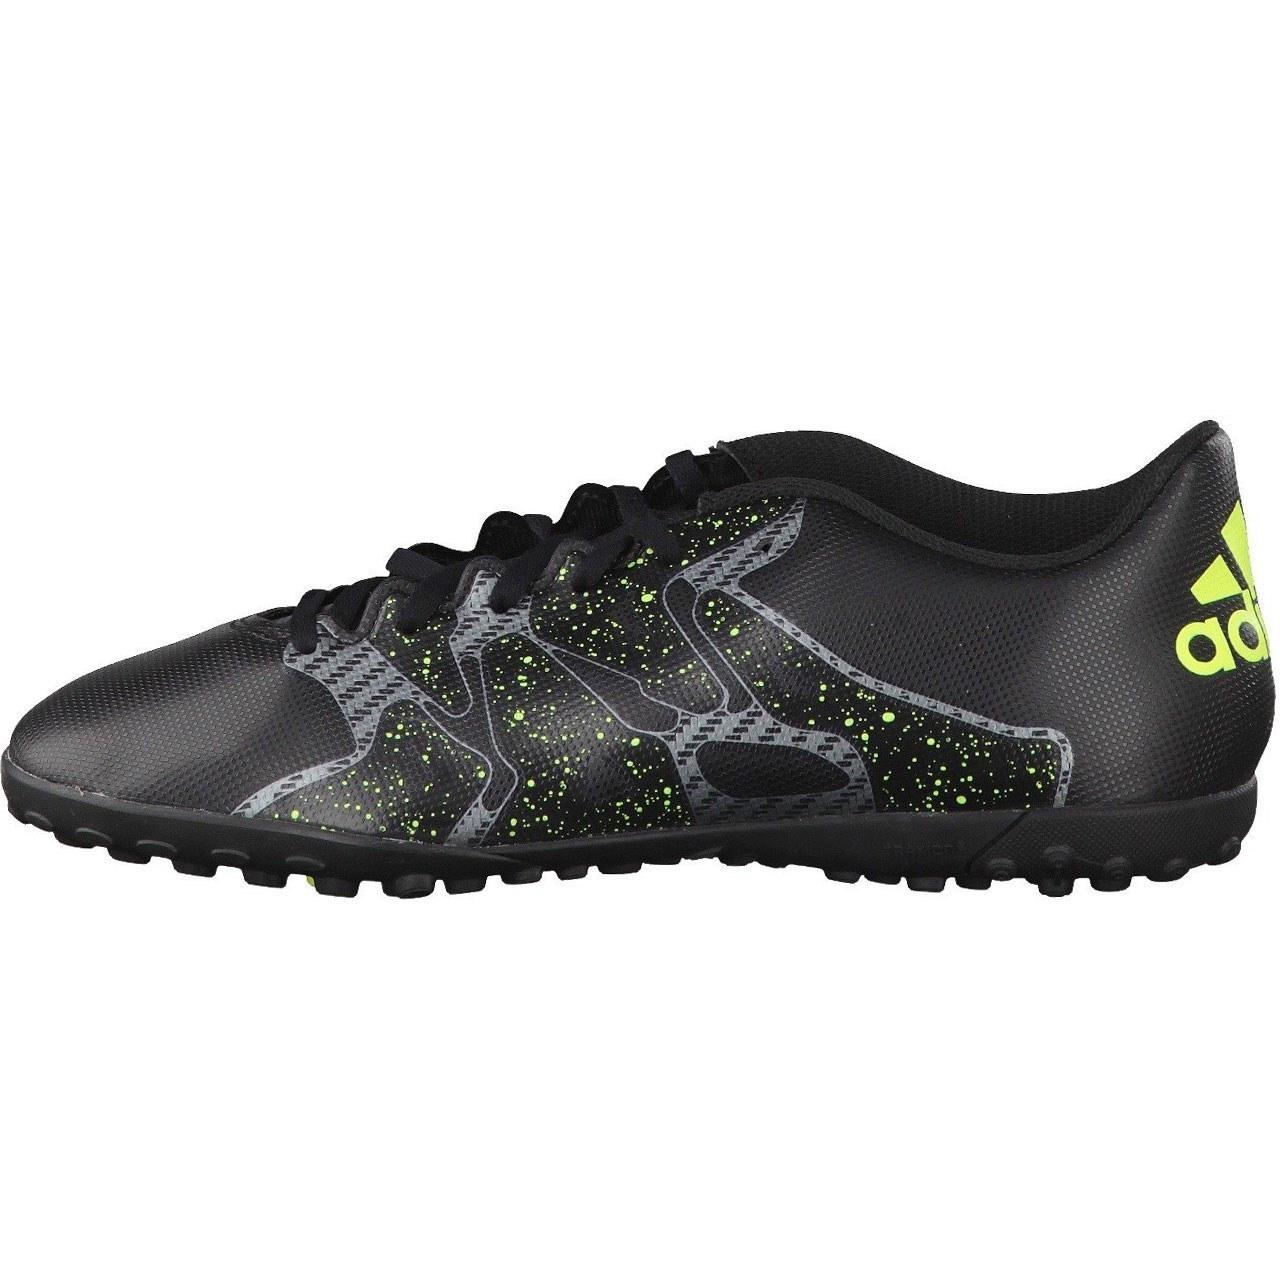 sale retailer b09a7 05df5 کفش فوتبال مردانه آديداس مدل Chaos X 15.4